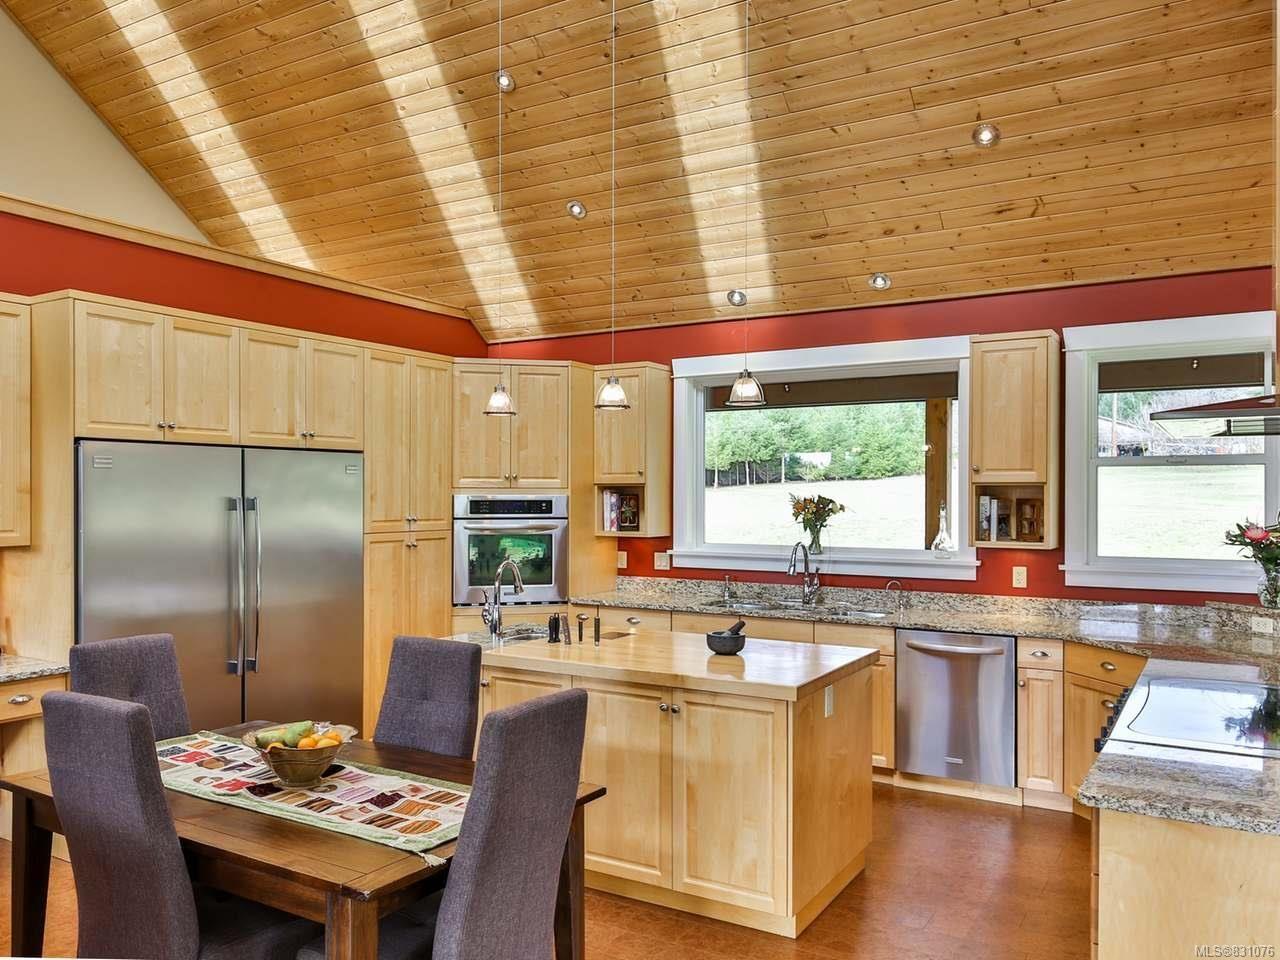 Photo 9: Photos: 6159 Strathcona St in PORT ALBERNI: PA Alberni Valley House for sale (Port Alberni)  : MLS®# 831076